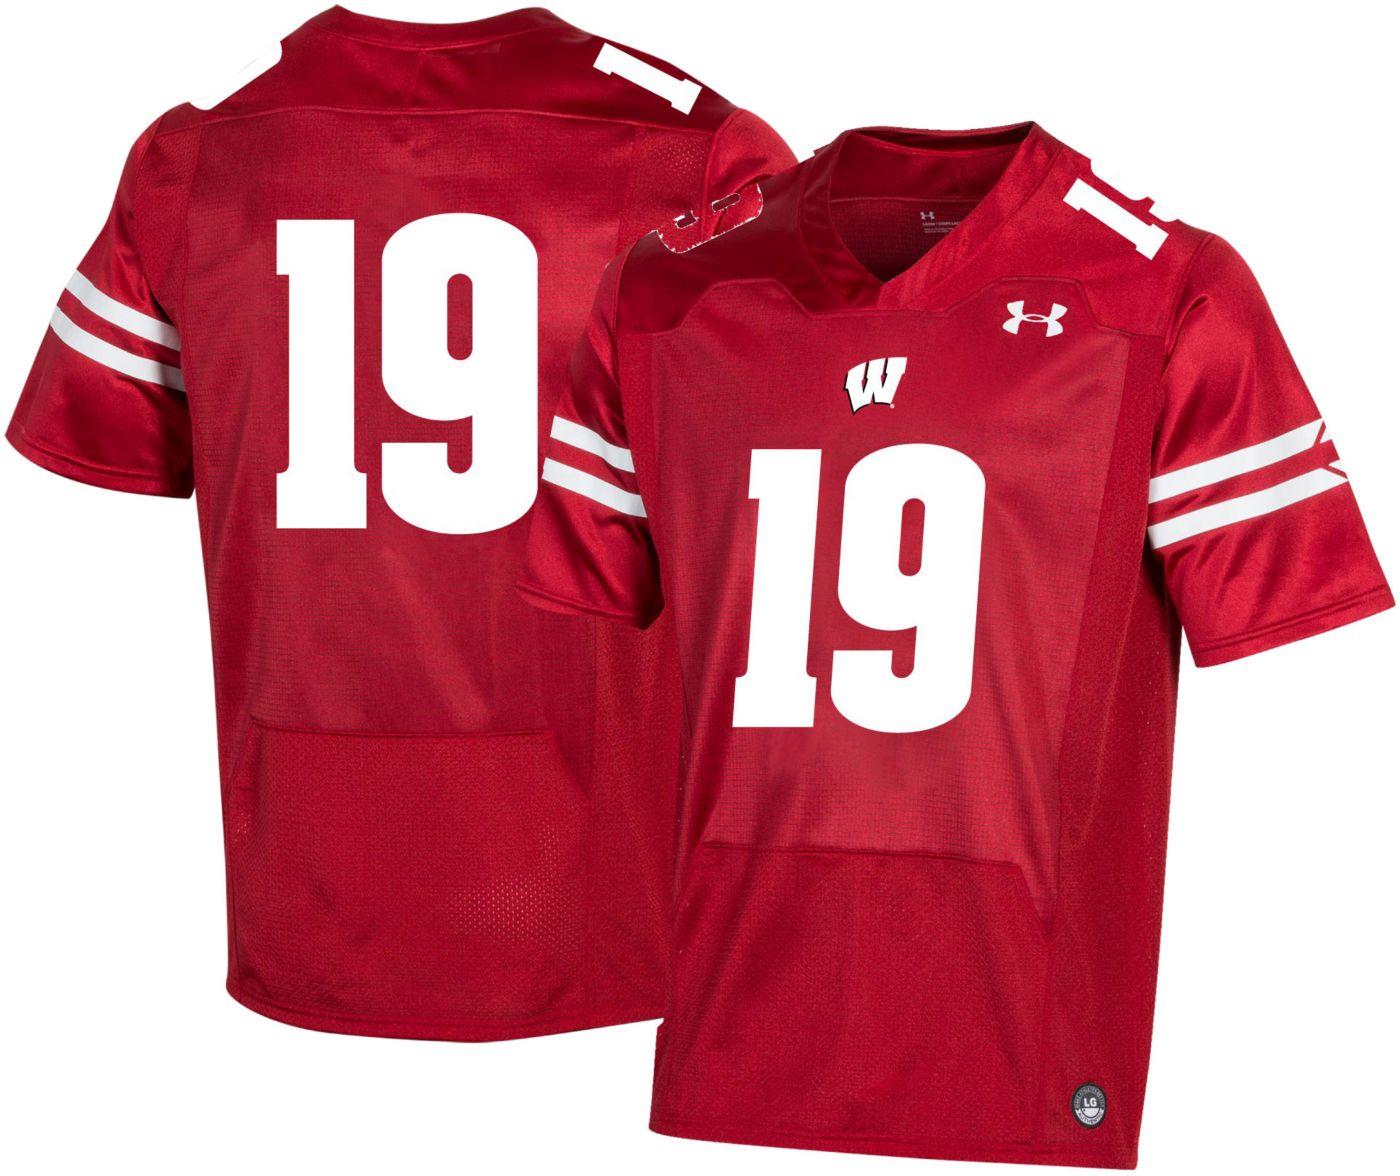 Under Armour Men's Wisconsin Badgers #19 Red Replica Football Jersey